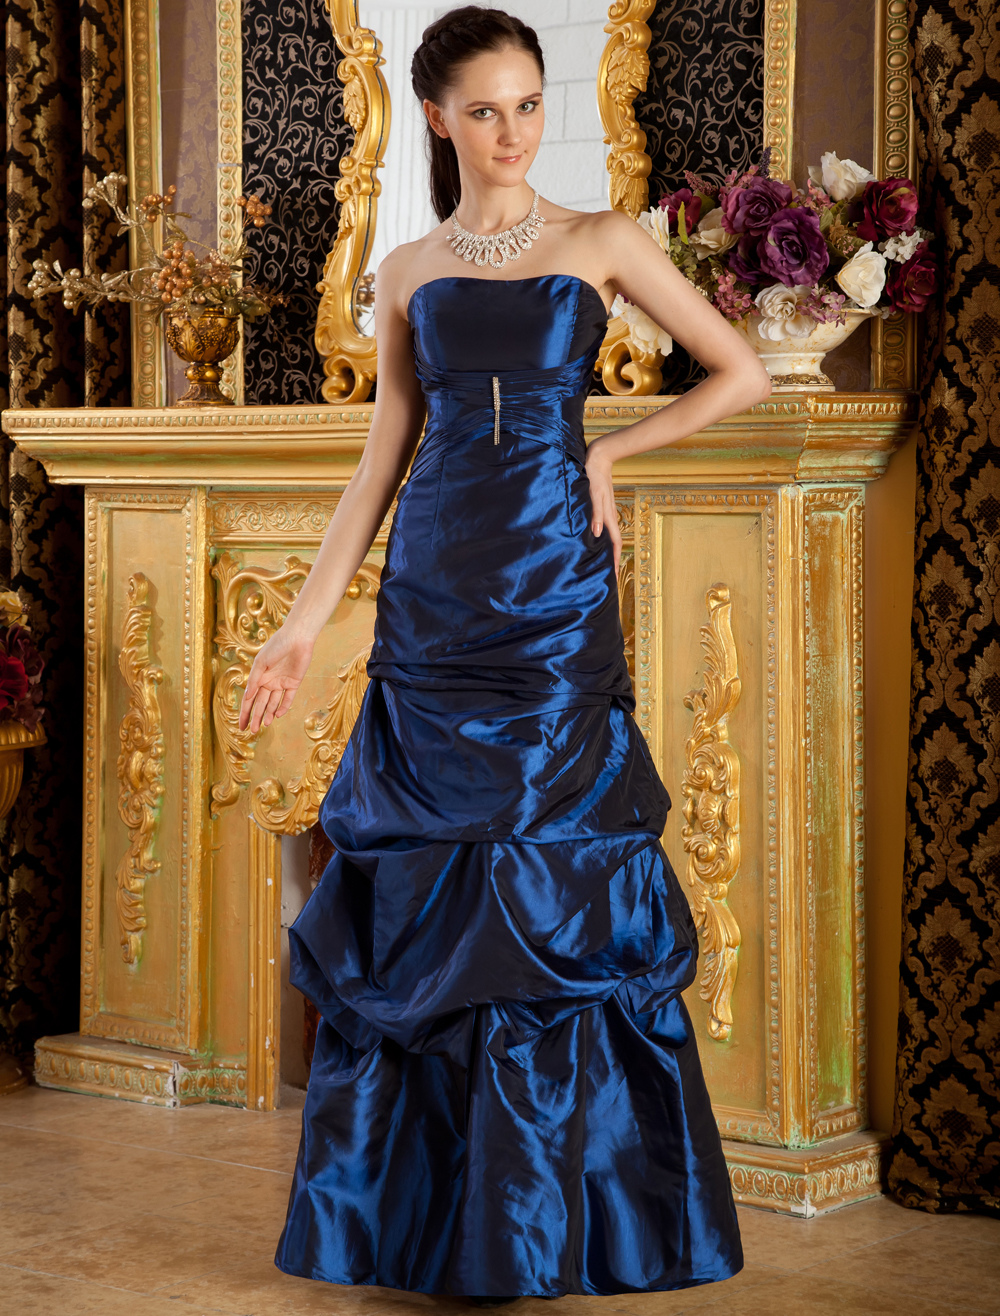 Royal Blue Strapless Toggle Taffeta Evening Dress (Wedding Evening Dresses) photo